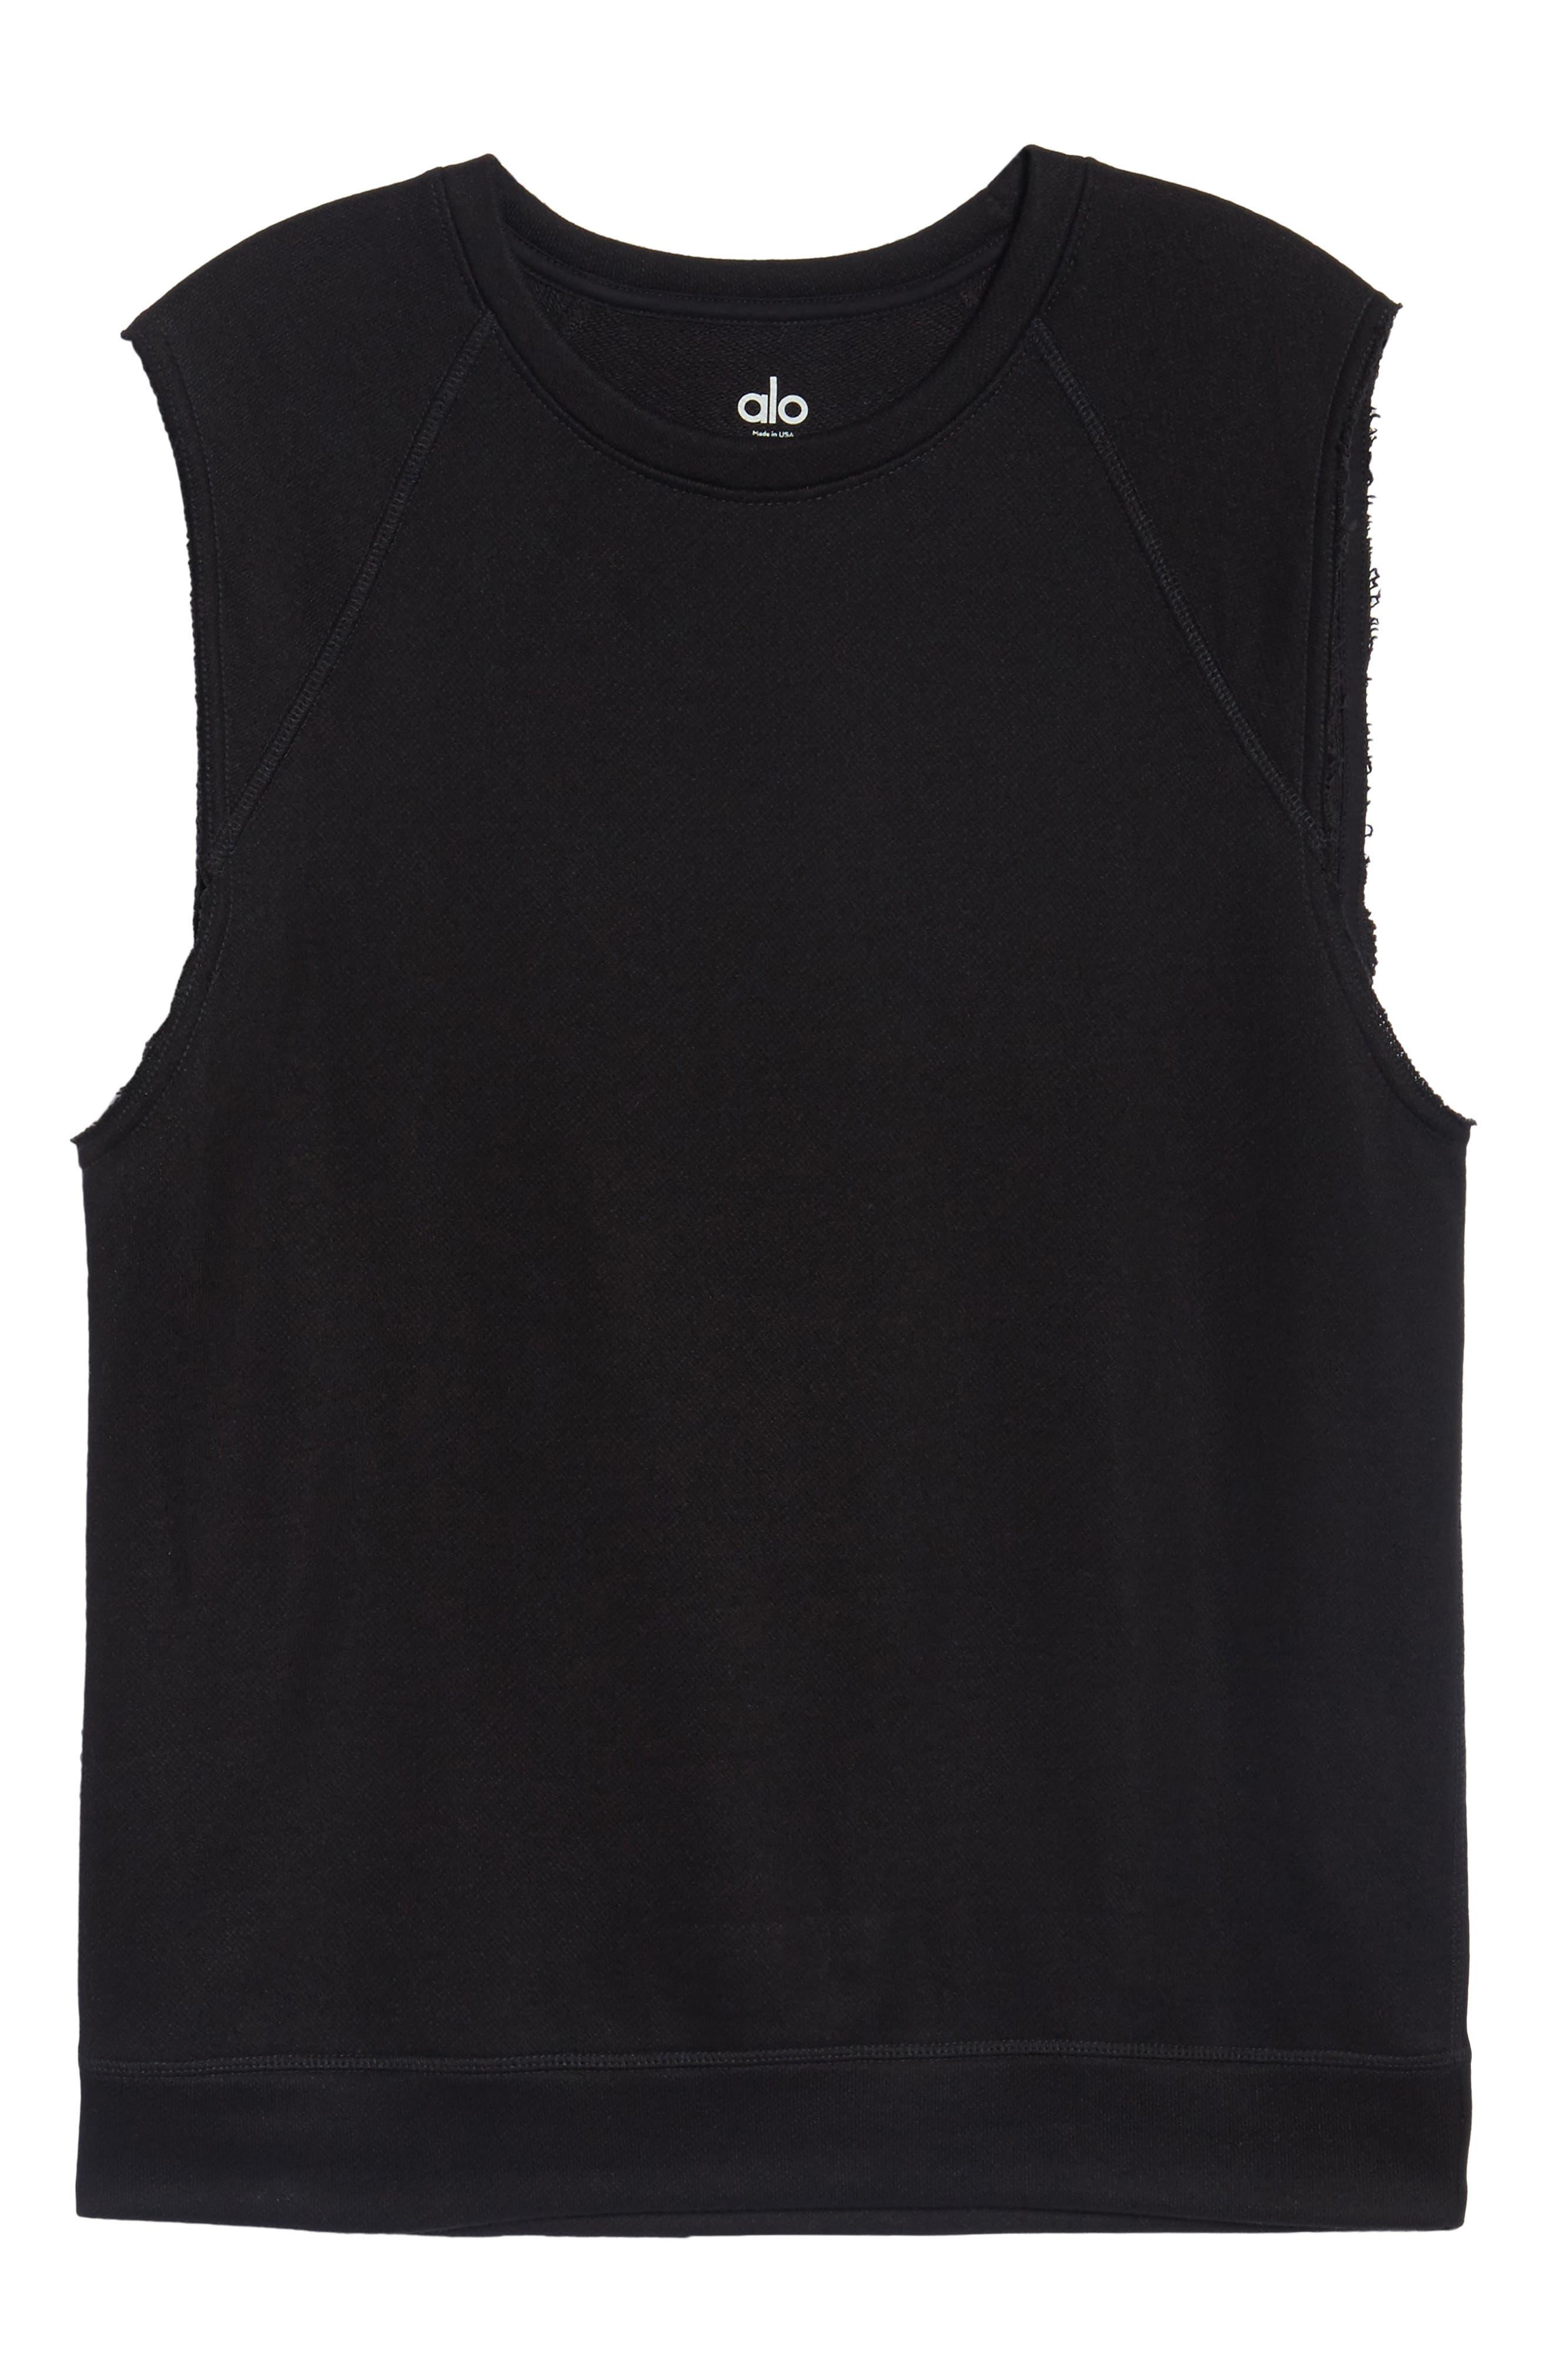 ALO, Dosha Relaxed Fit Sweatshirt Tank, Alternate thumbnail 6, color, BLACK